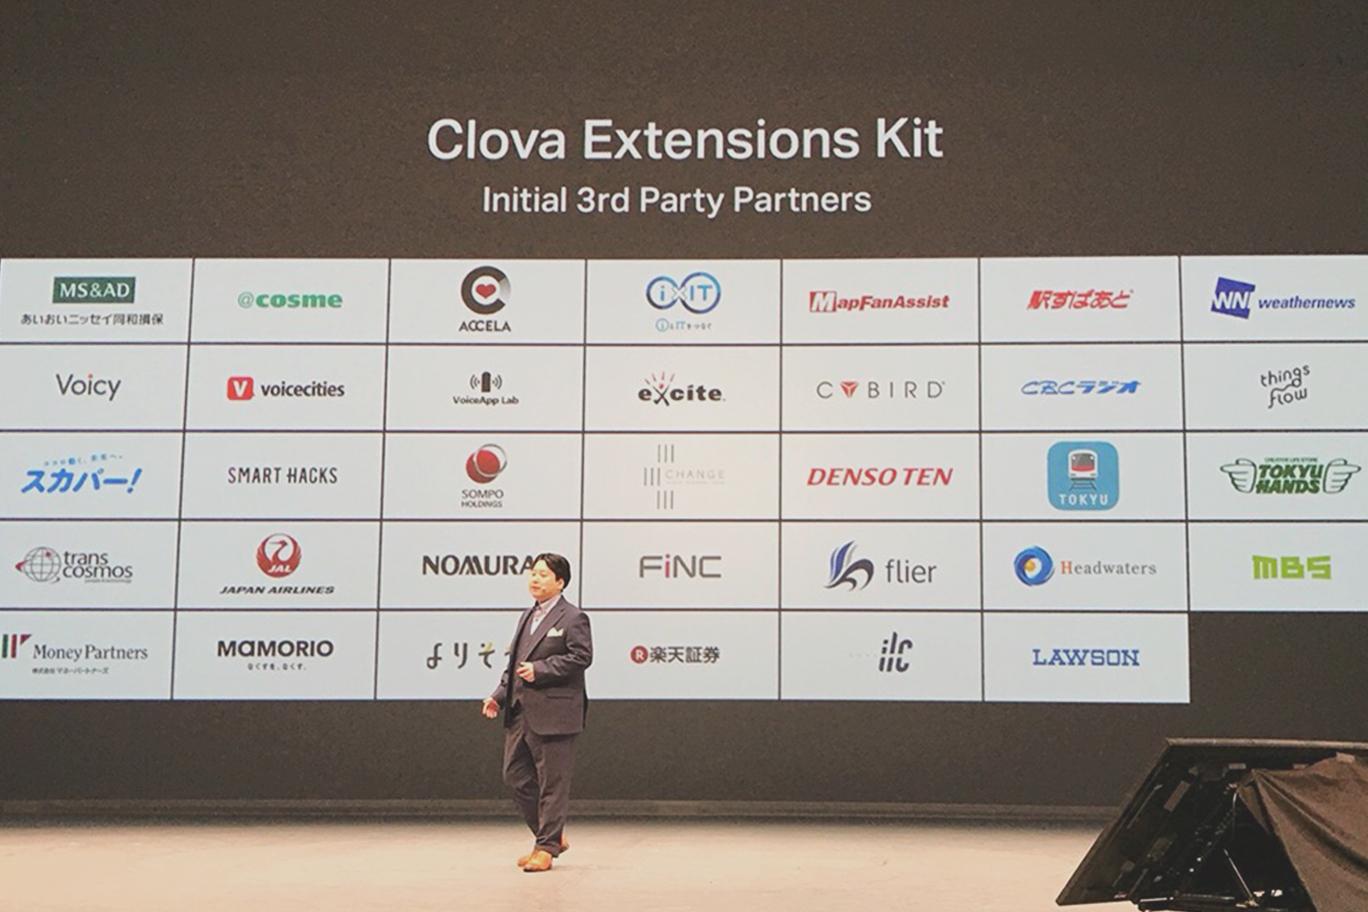 Voicyが「Clova」とfriendsにっ!速報、LINE CONFERENCEのClova関連発表まとめ